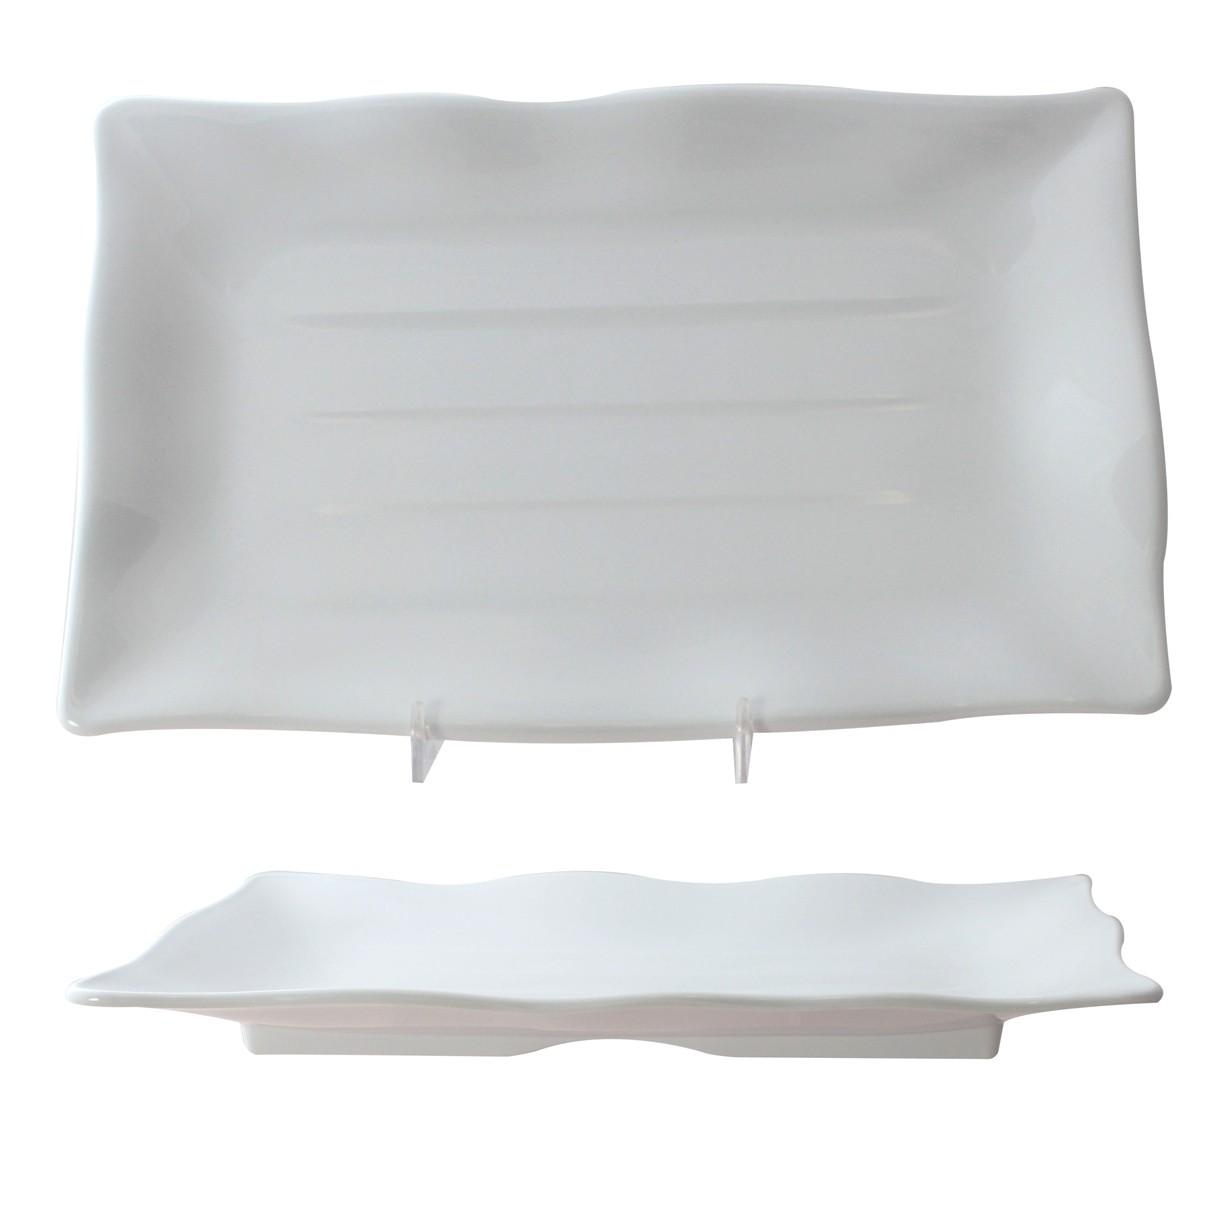 "Thunder Group 24120WT Classic White Rectangular Melamine Wave Plate 11-1/4"" x 7-1/4"""